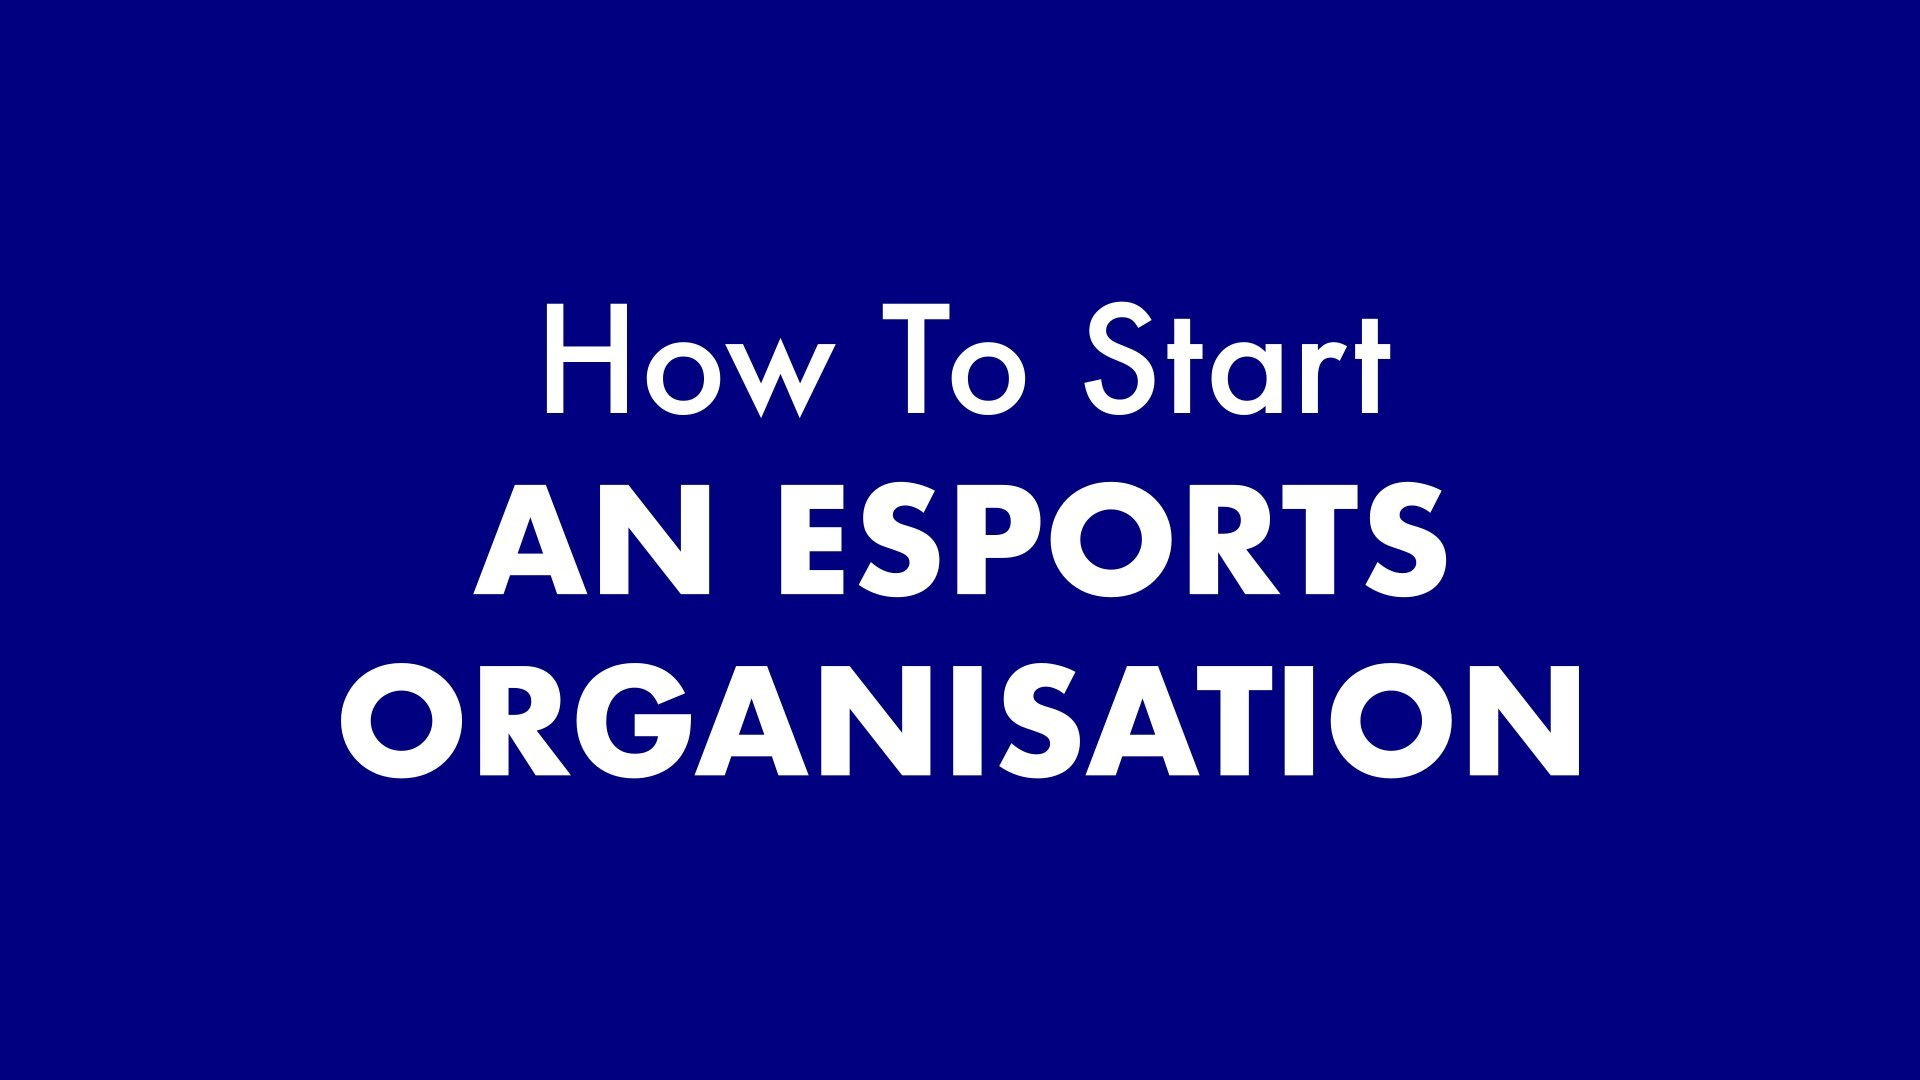 How to start an eSports organisation